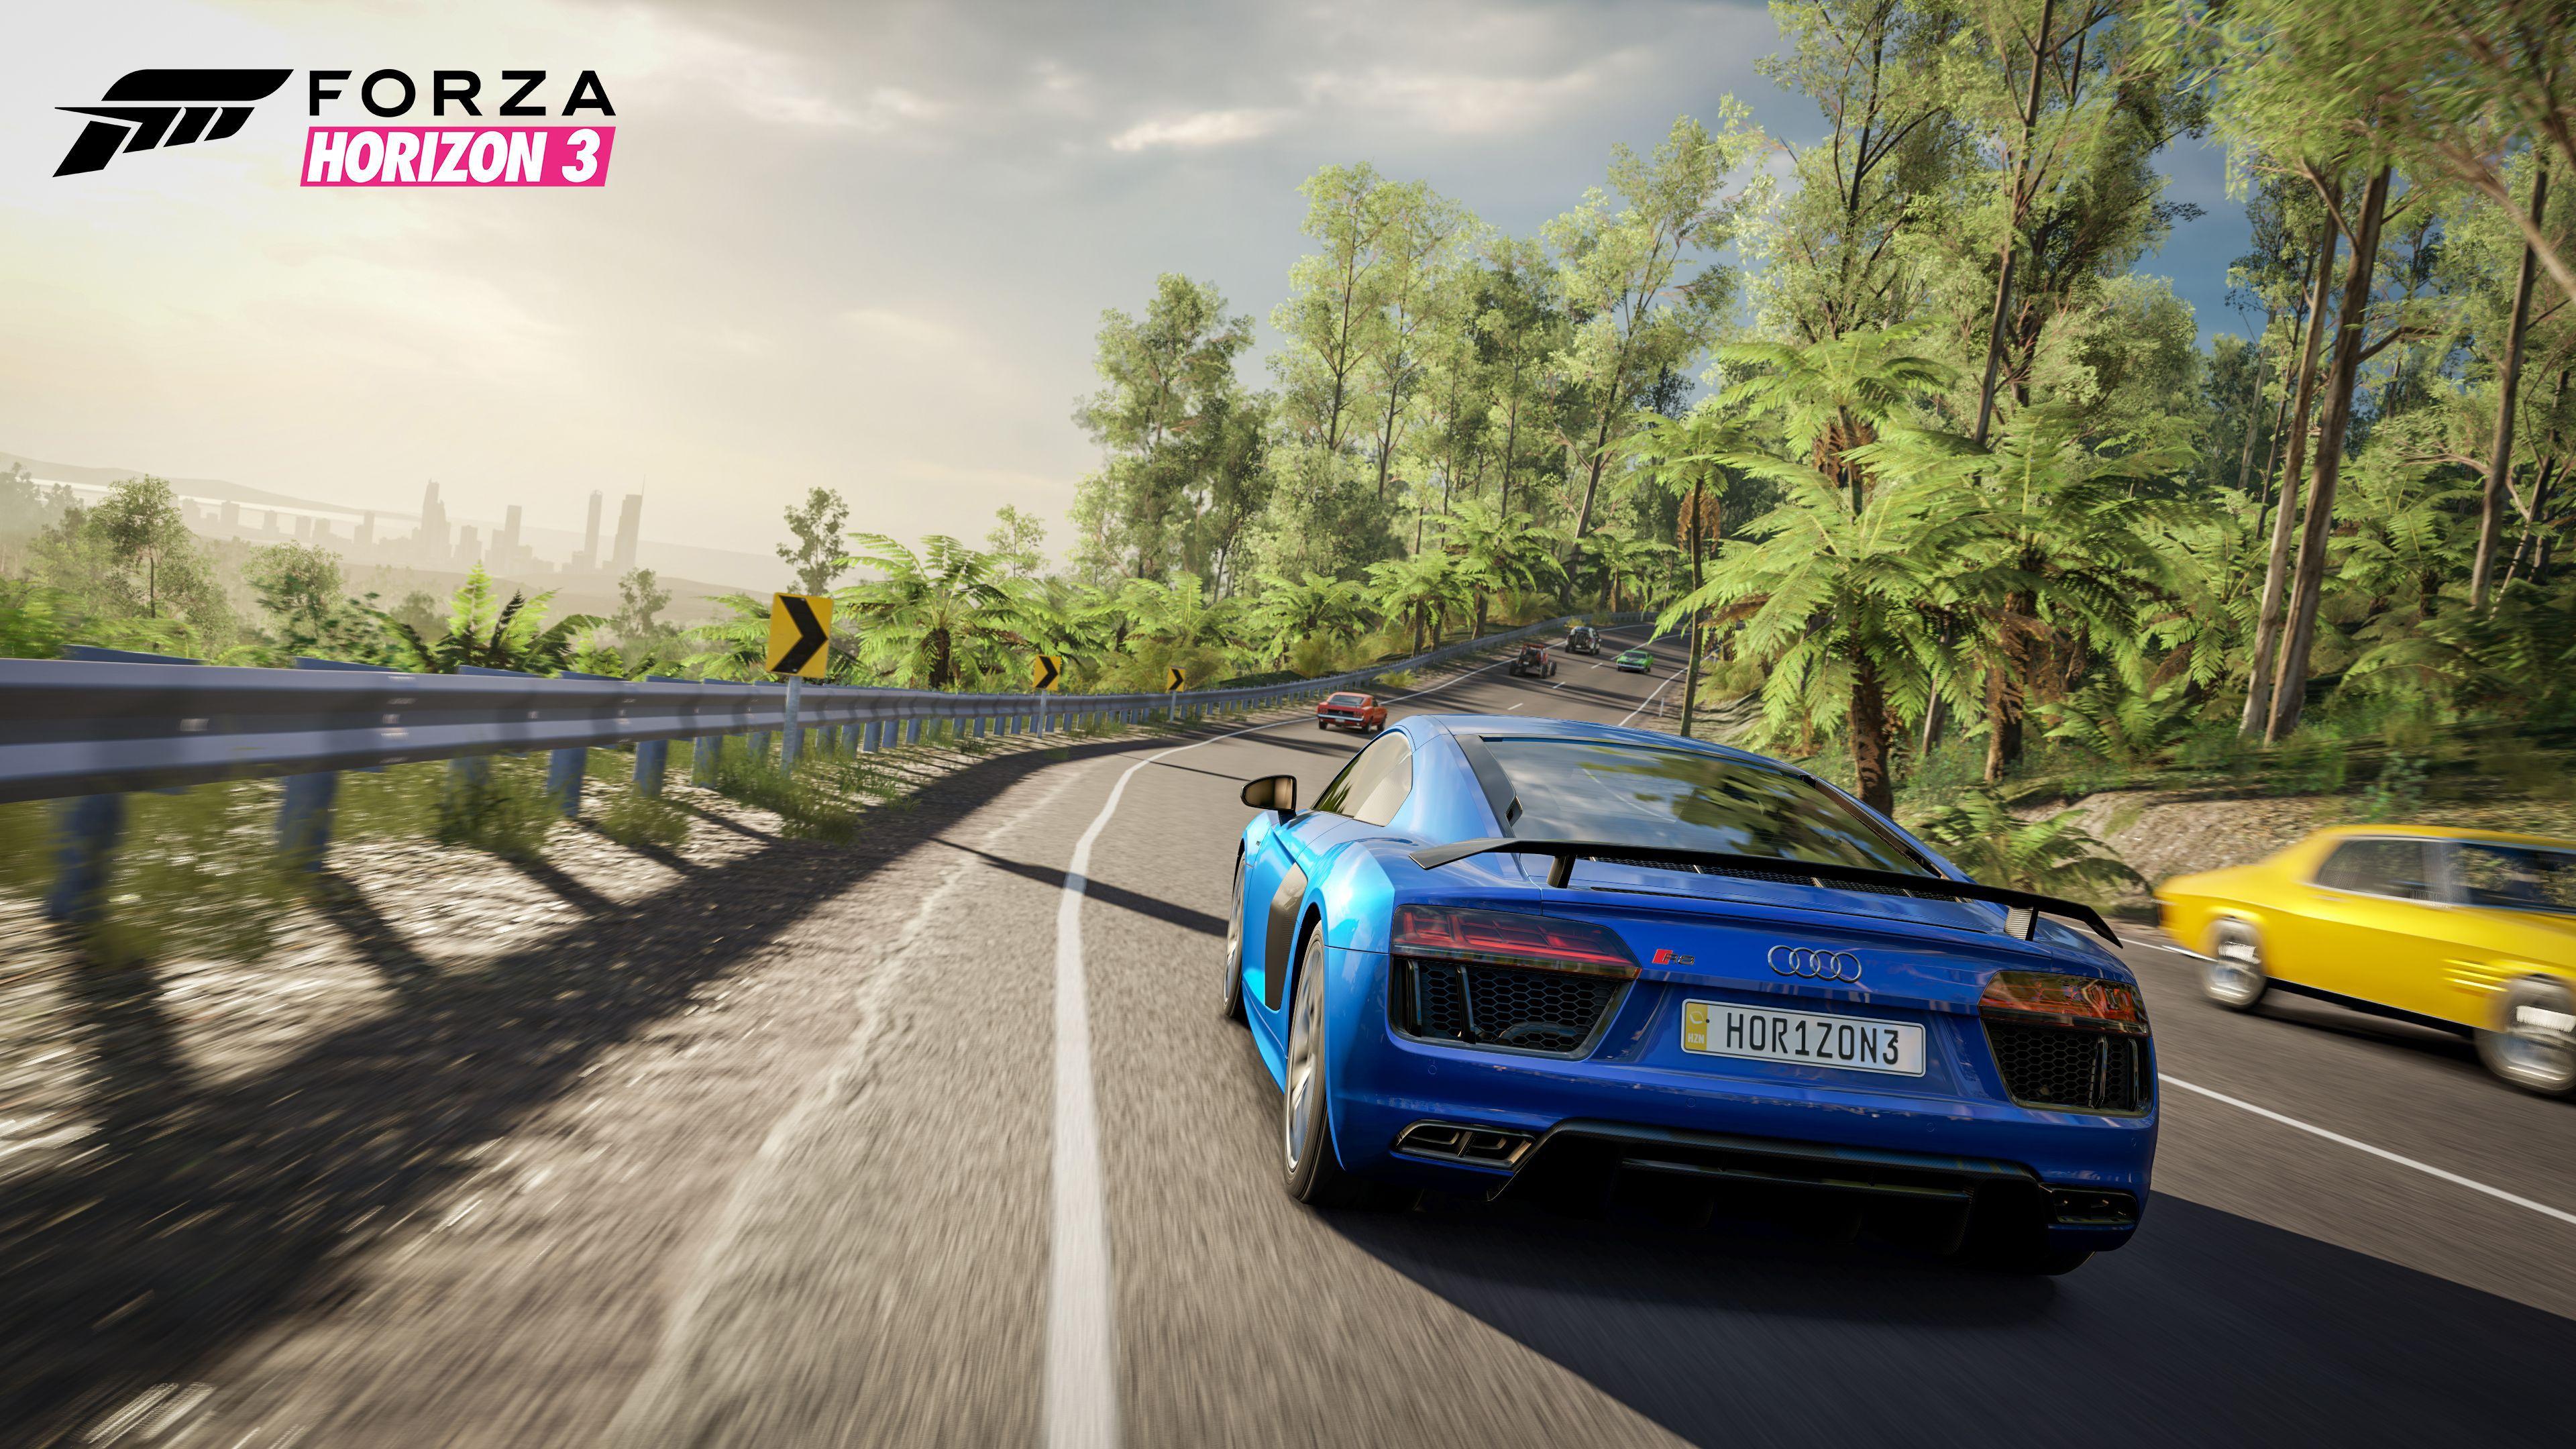 Forza Horizon 3 HD Background